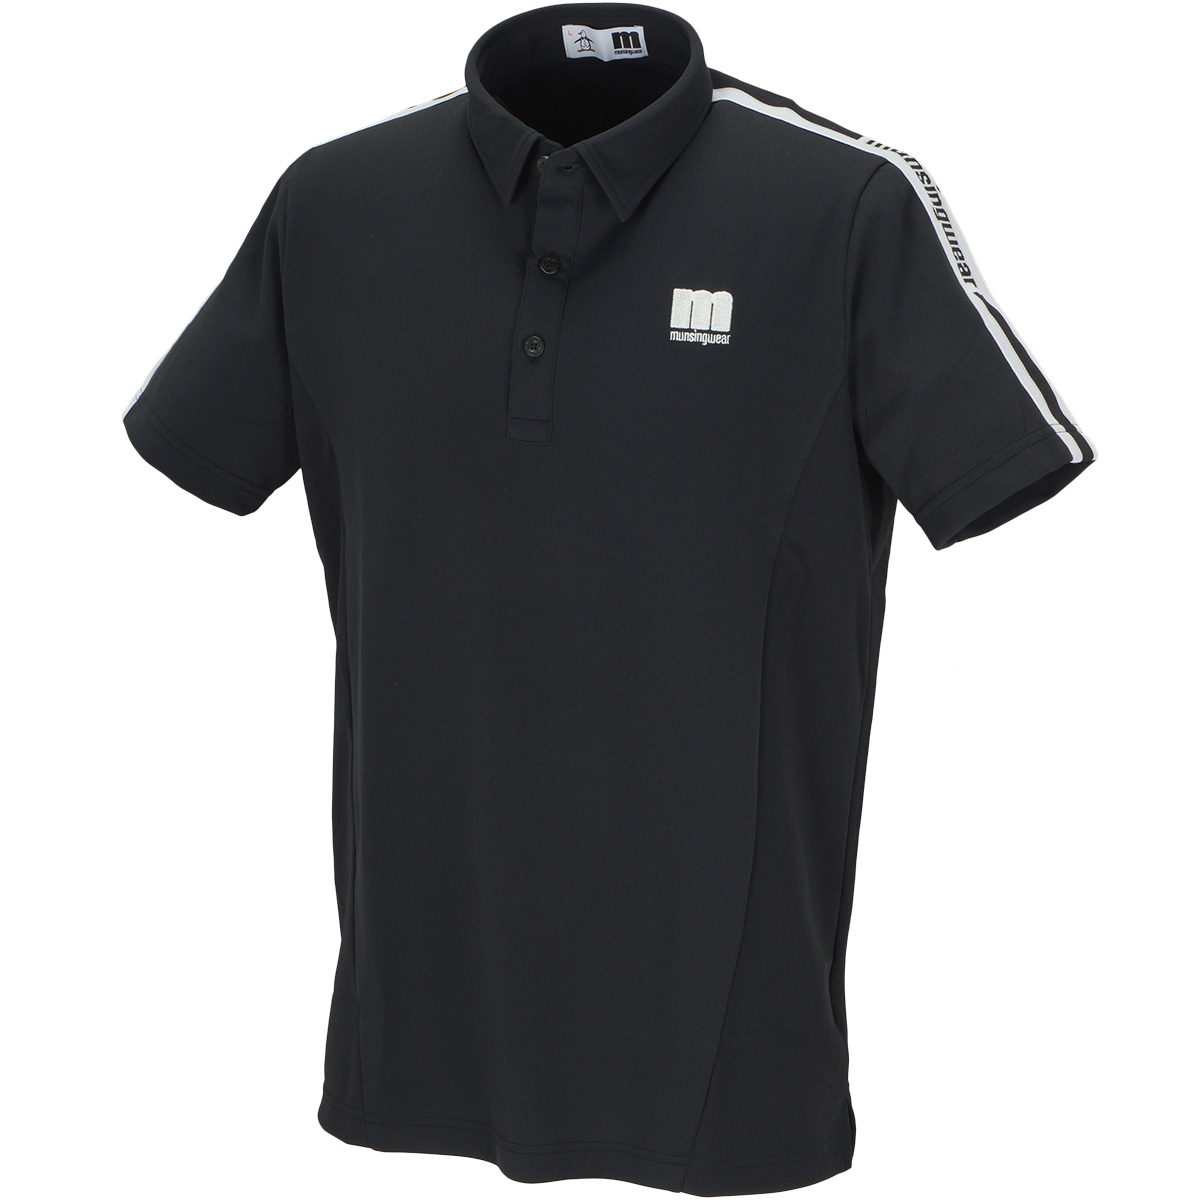 ENVOY COOLISTメッシュ半袖ポロシャツ